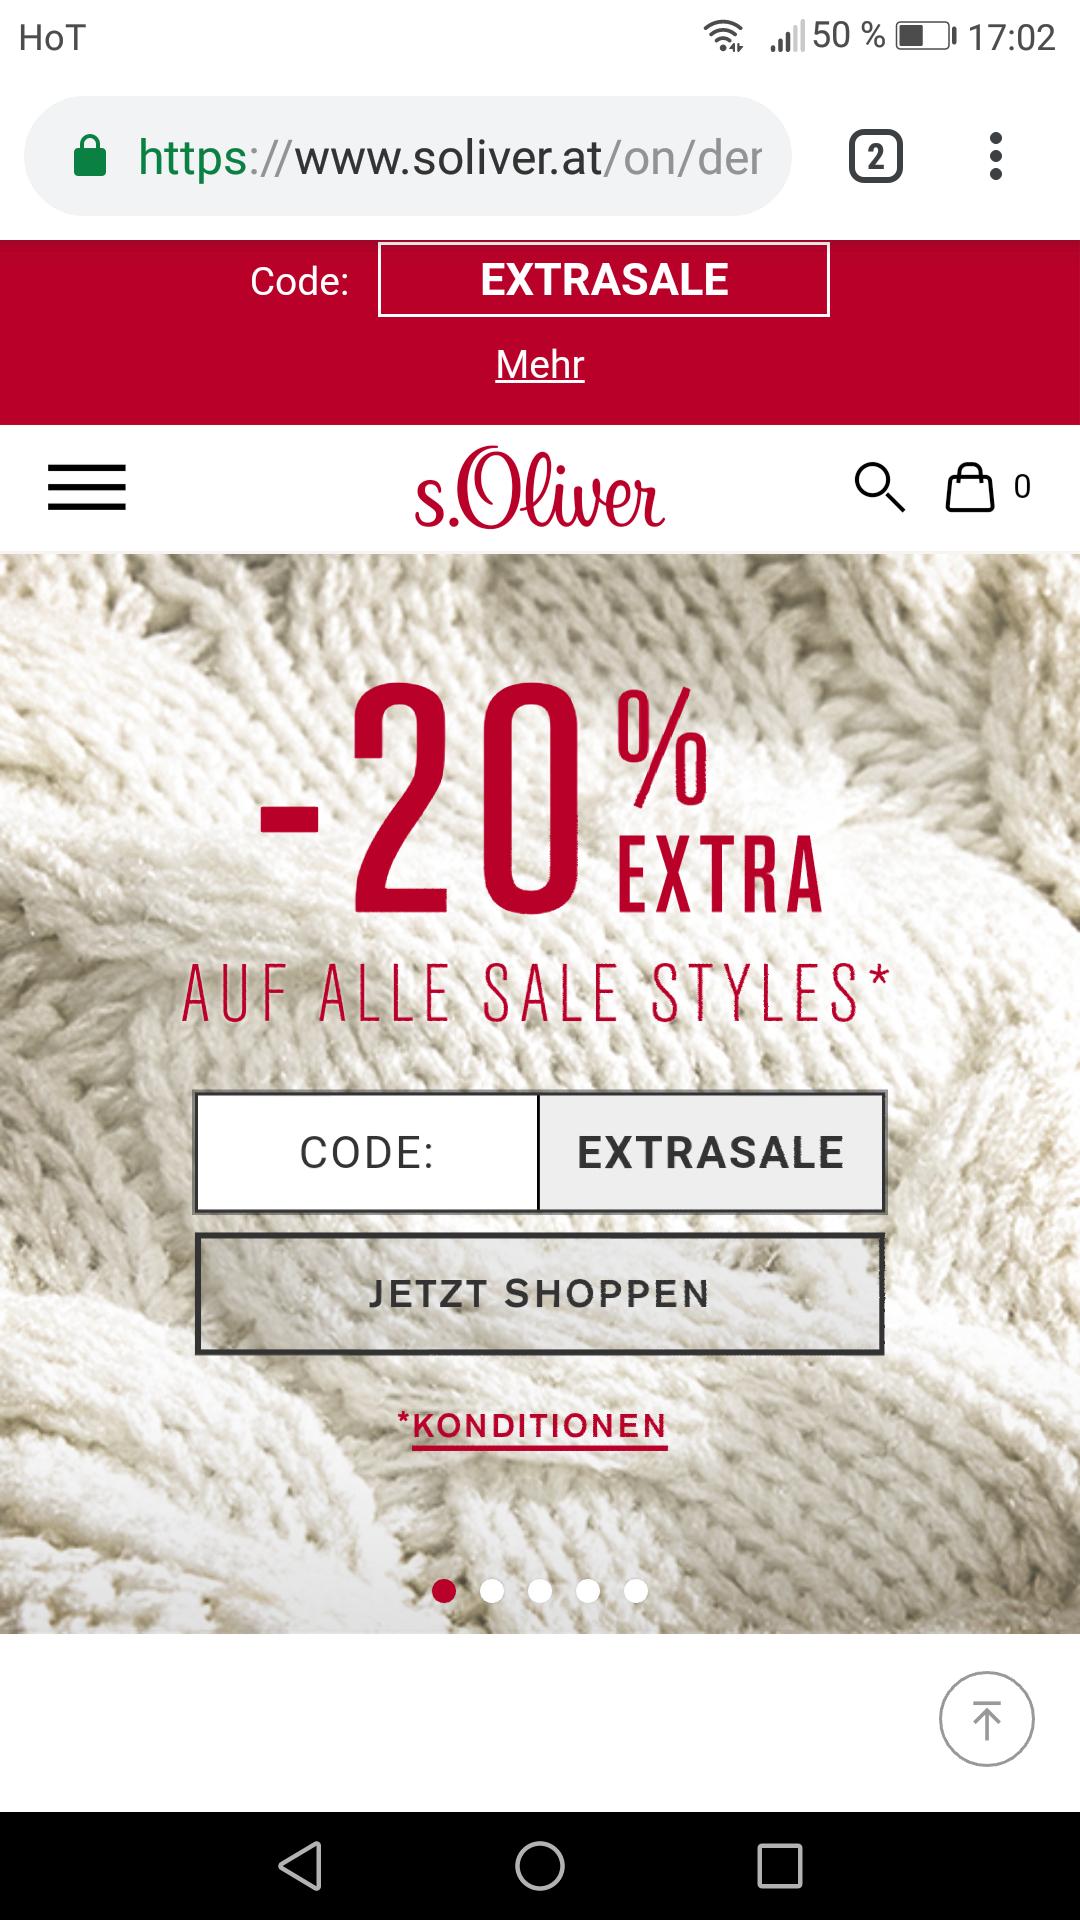 S.oliver 20 Prozent extra Rabatt auf sale